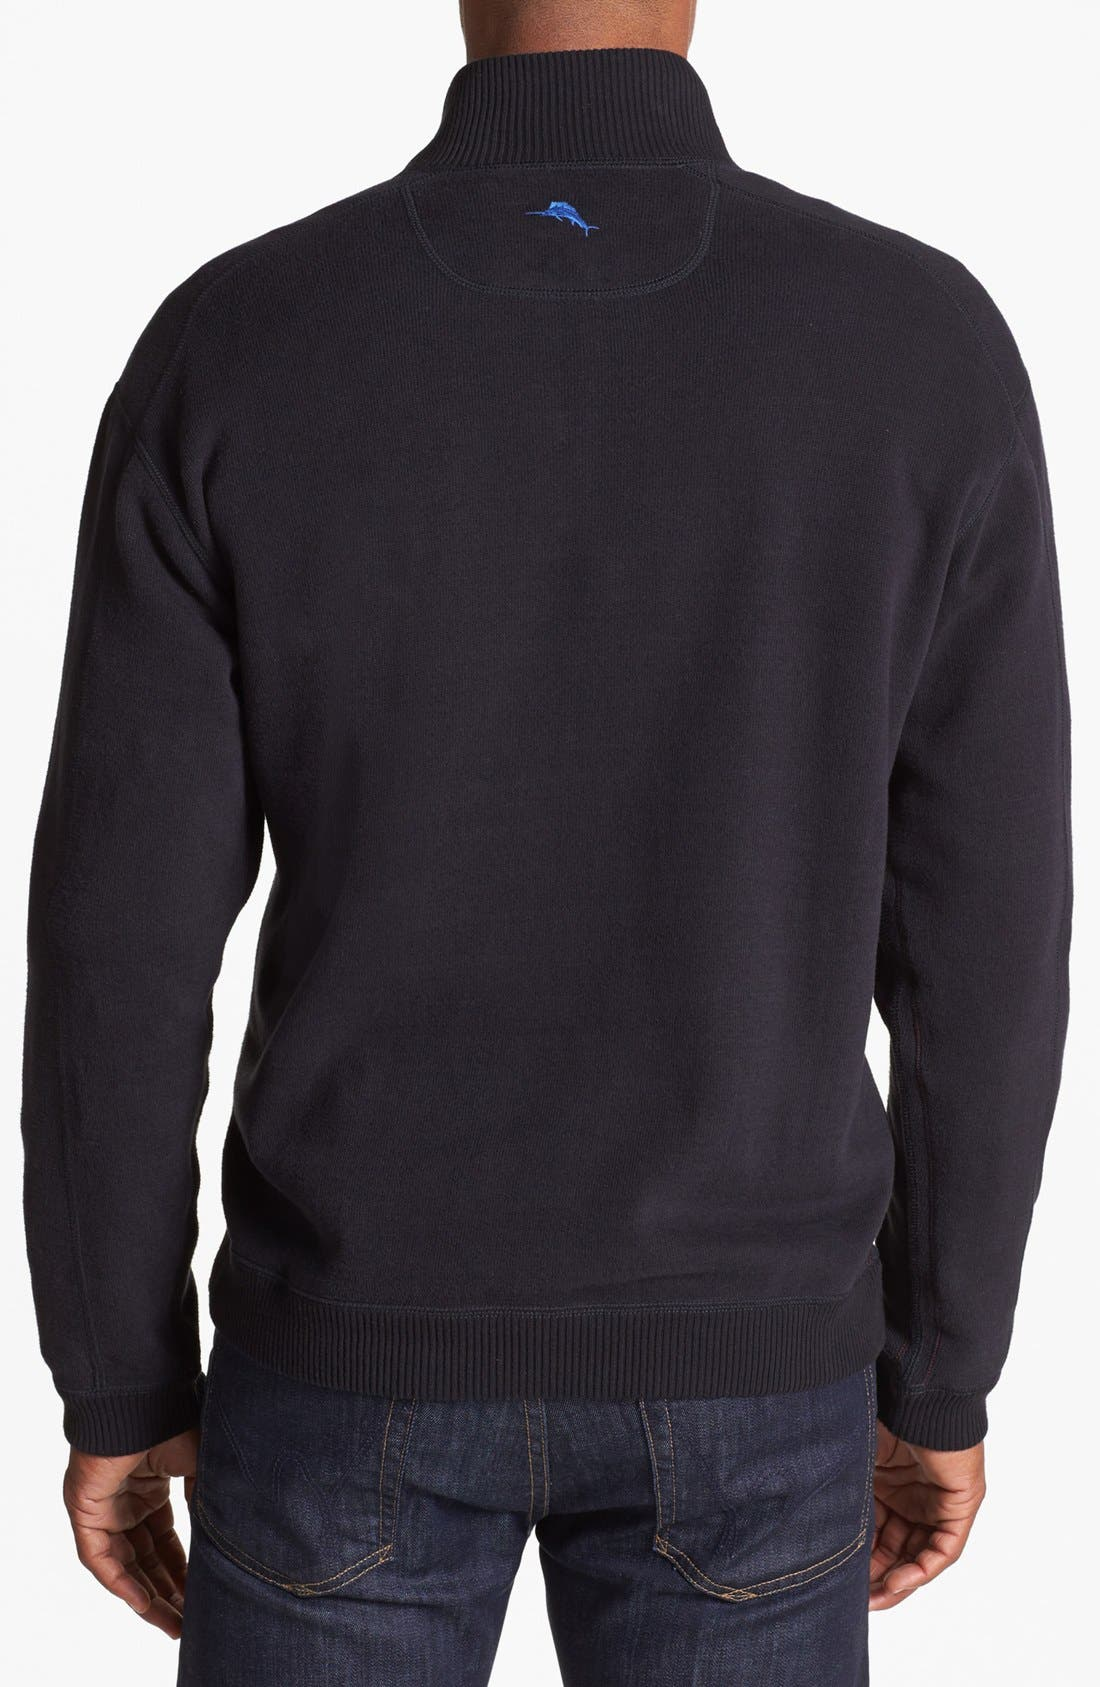 Alternate Image 3  - Tommy Bahama 'Flip Side Pro' Half Zip Pullover (Big & Tall)